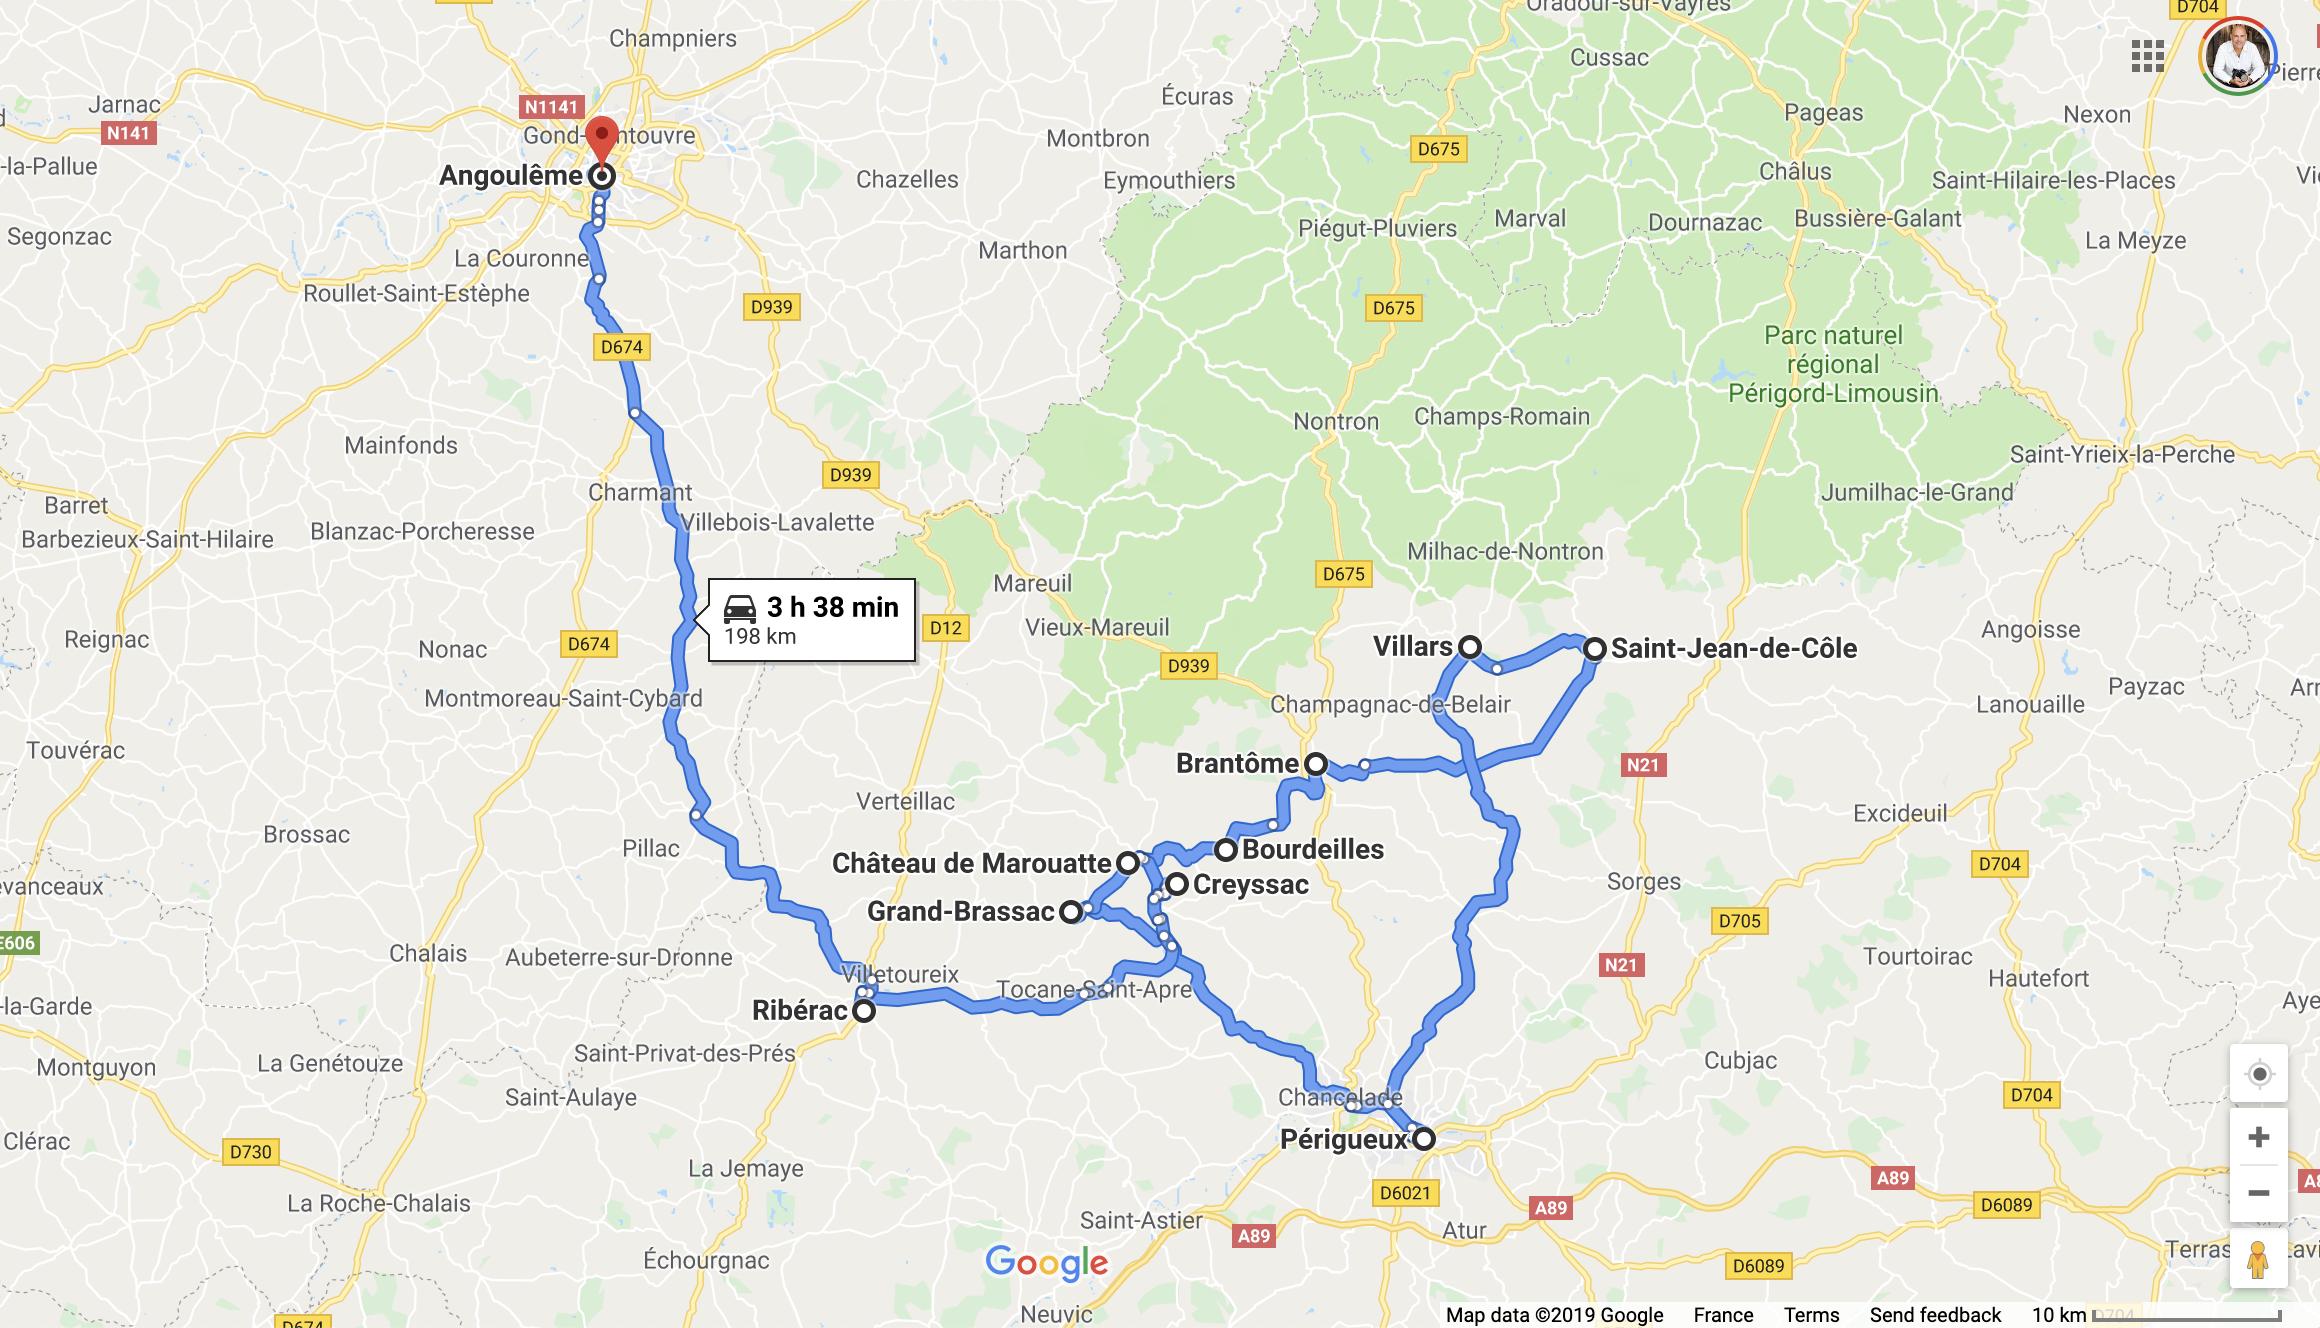 Detailed Map of Villages in Dordogne